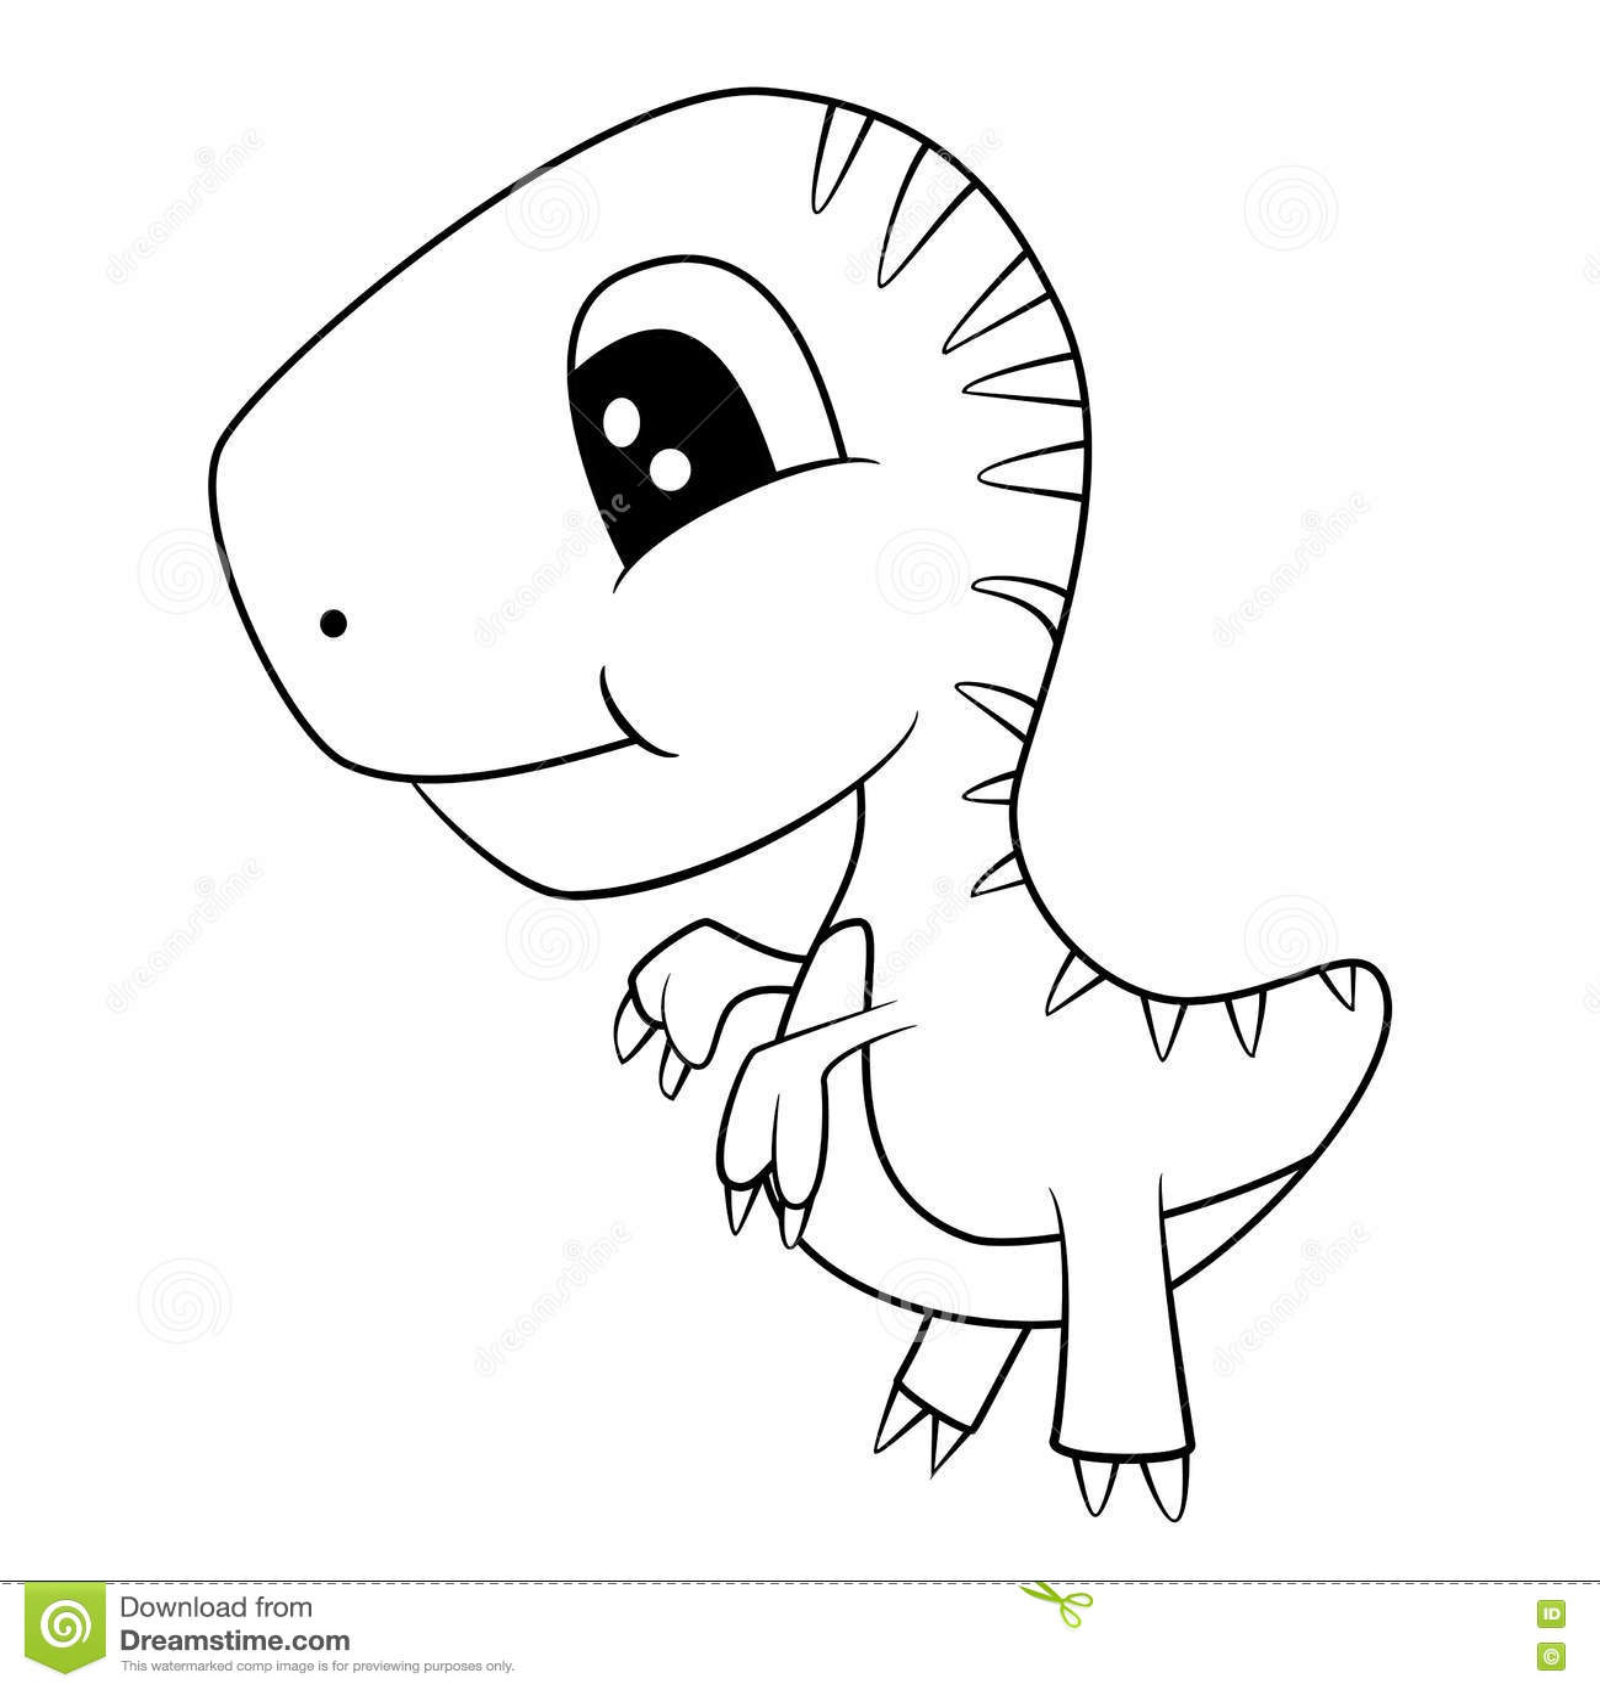 Tyrannosaurus Rex Drawing Easy Spinosaurus Coloring Pages